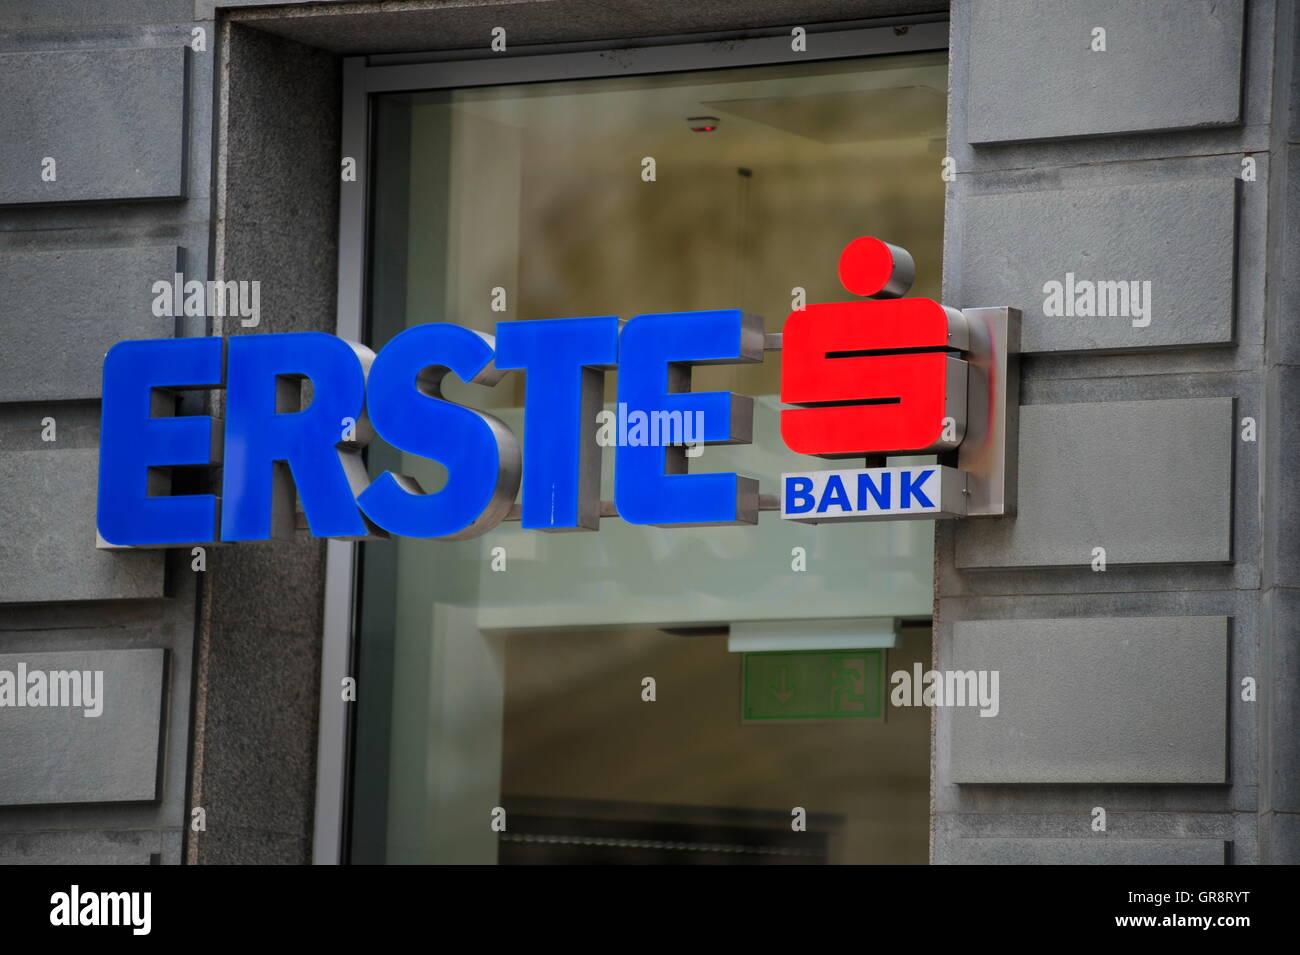 Erste bank investment hungary ltd 6wunderkinder investment calculators